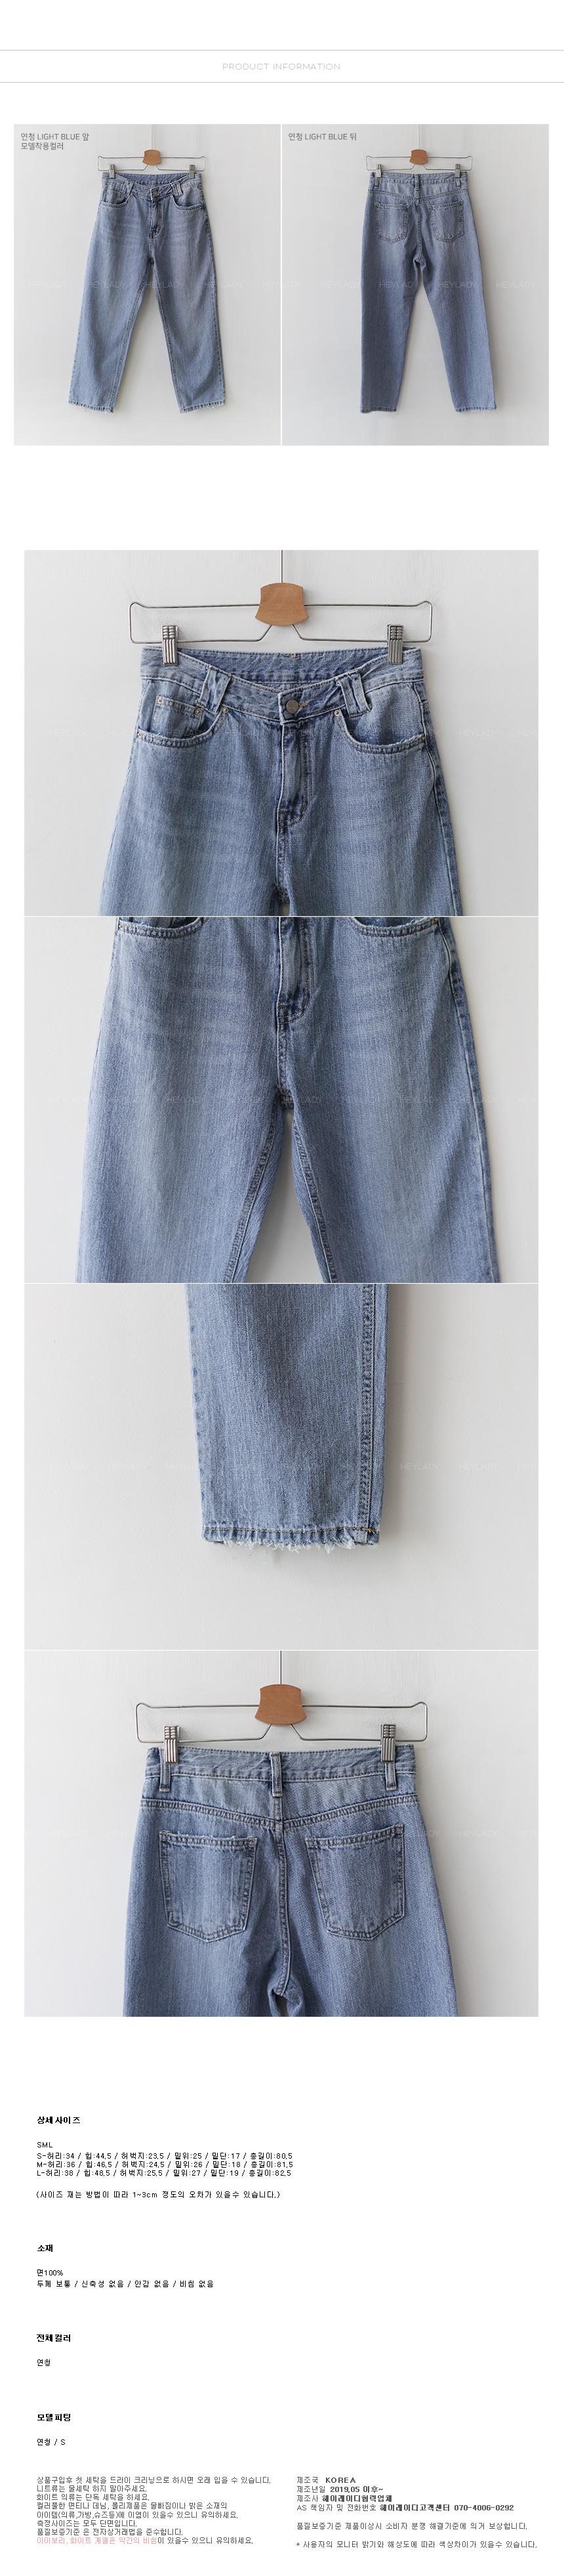 Rudy Washing denim pants